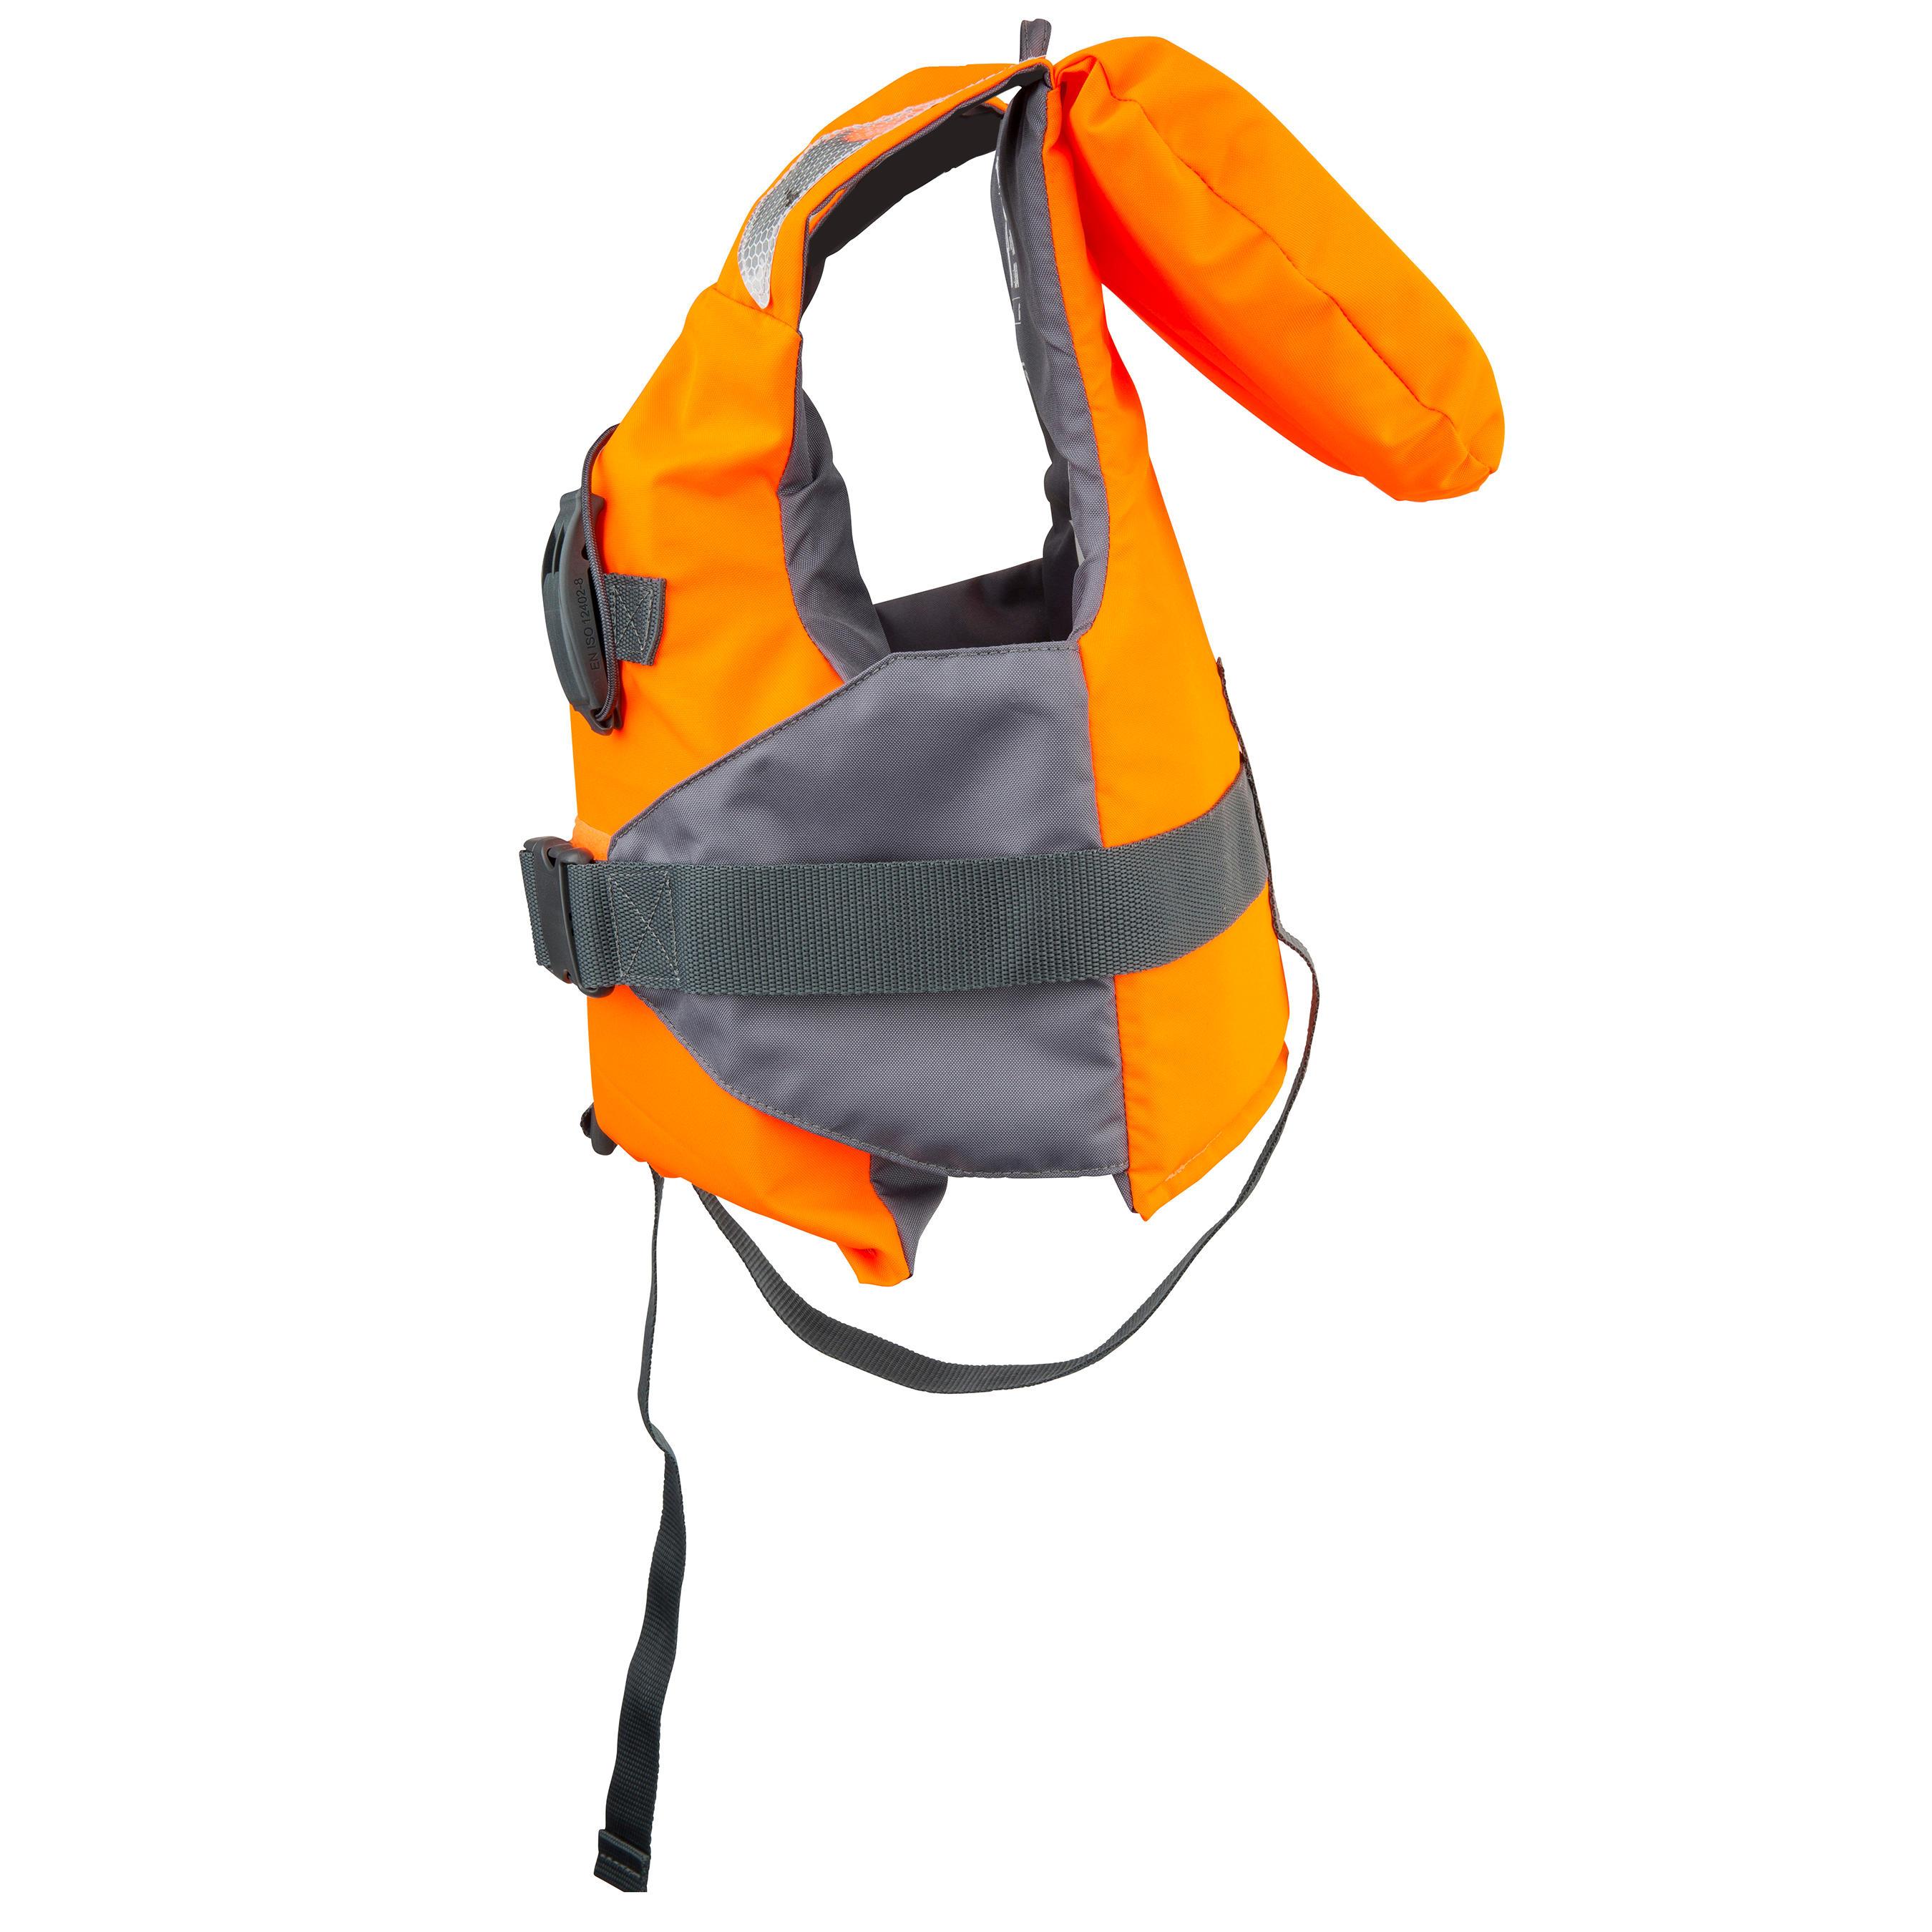 LJ 100N EASY Children's Foam Life Jacket - Orange/Grey